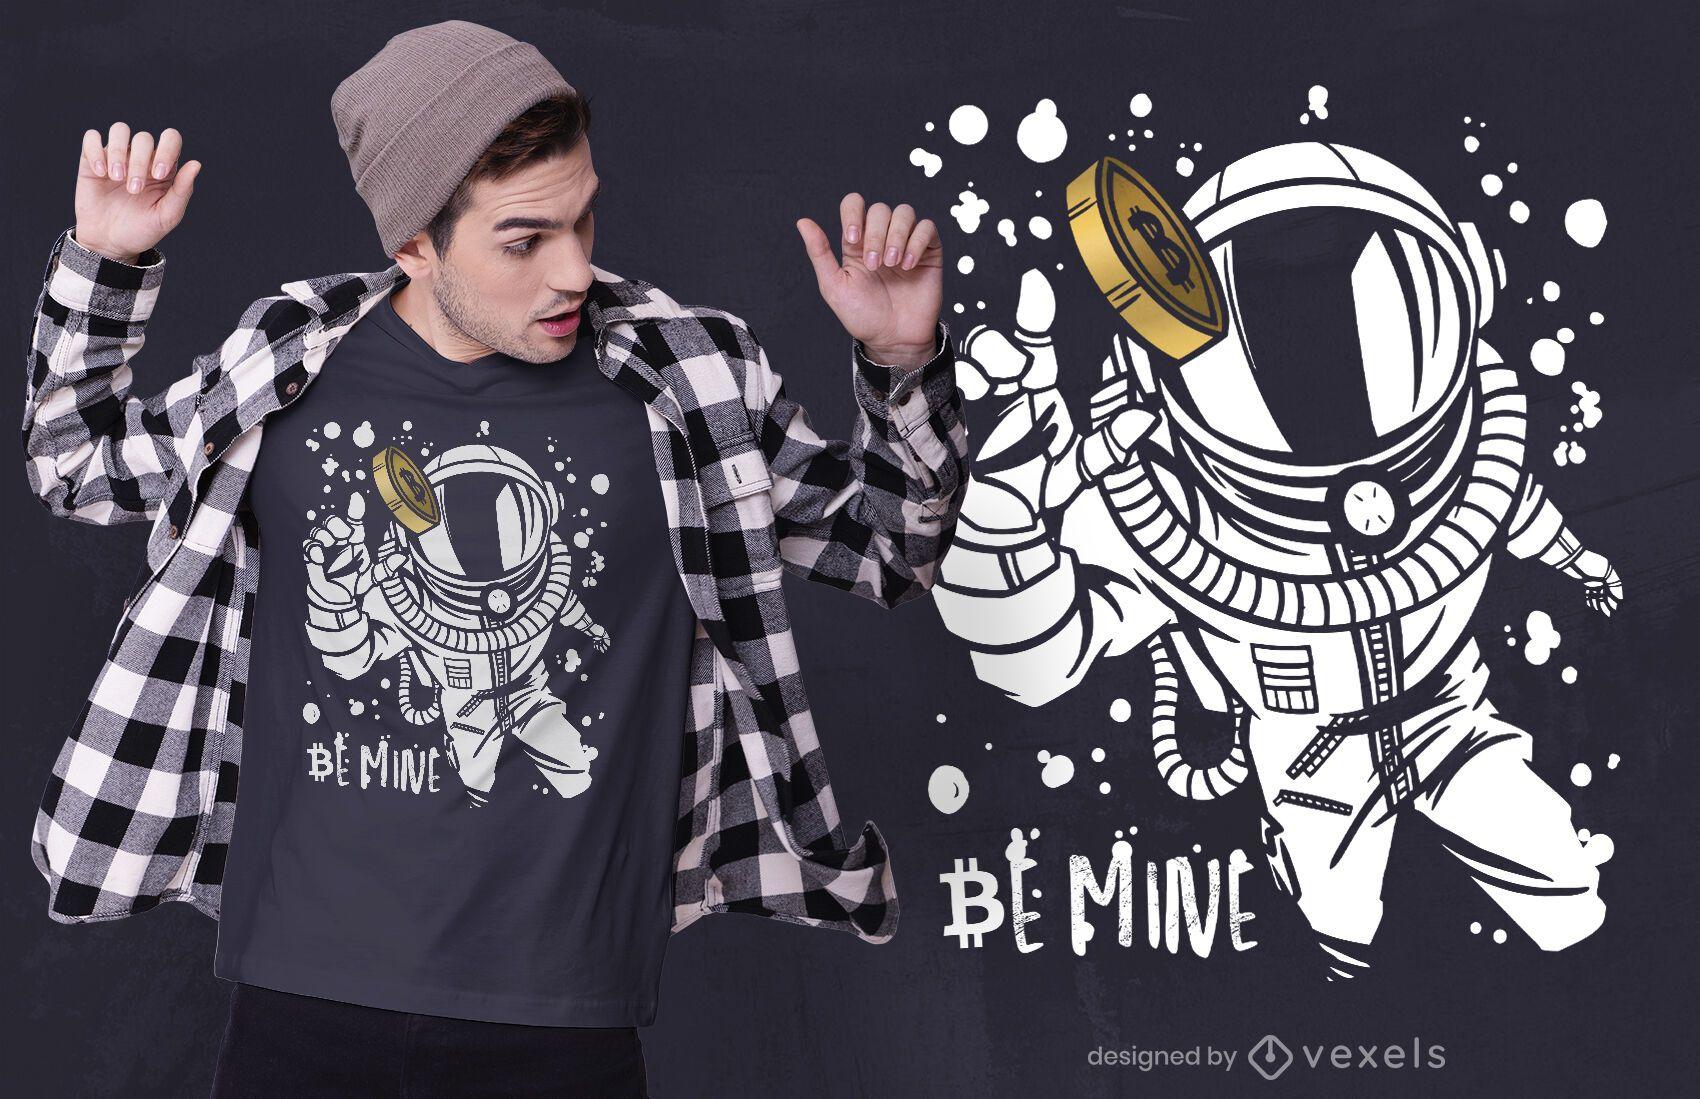 Bitcoin astronaut t-shirt design